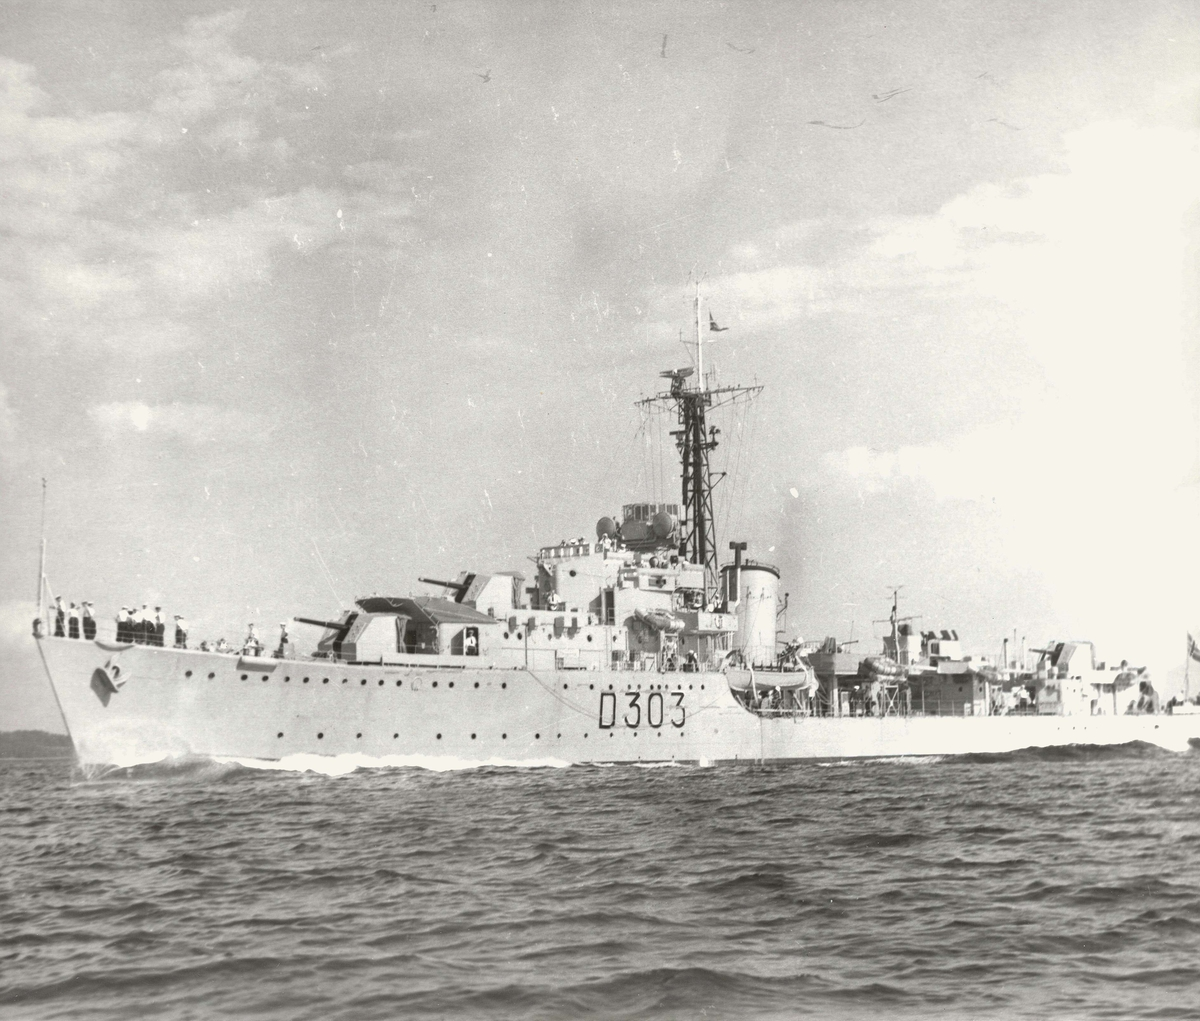 Motiv: Jageren KNM OSLO (D303) babord side